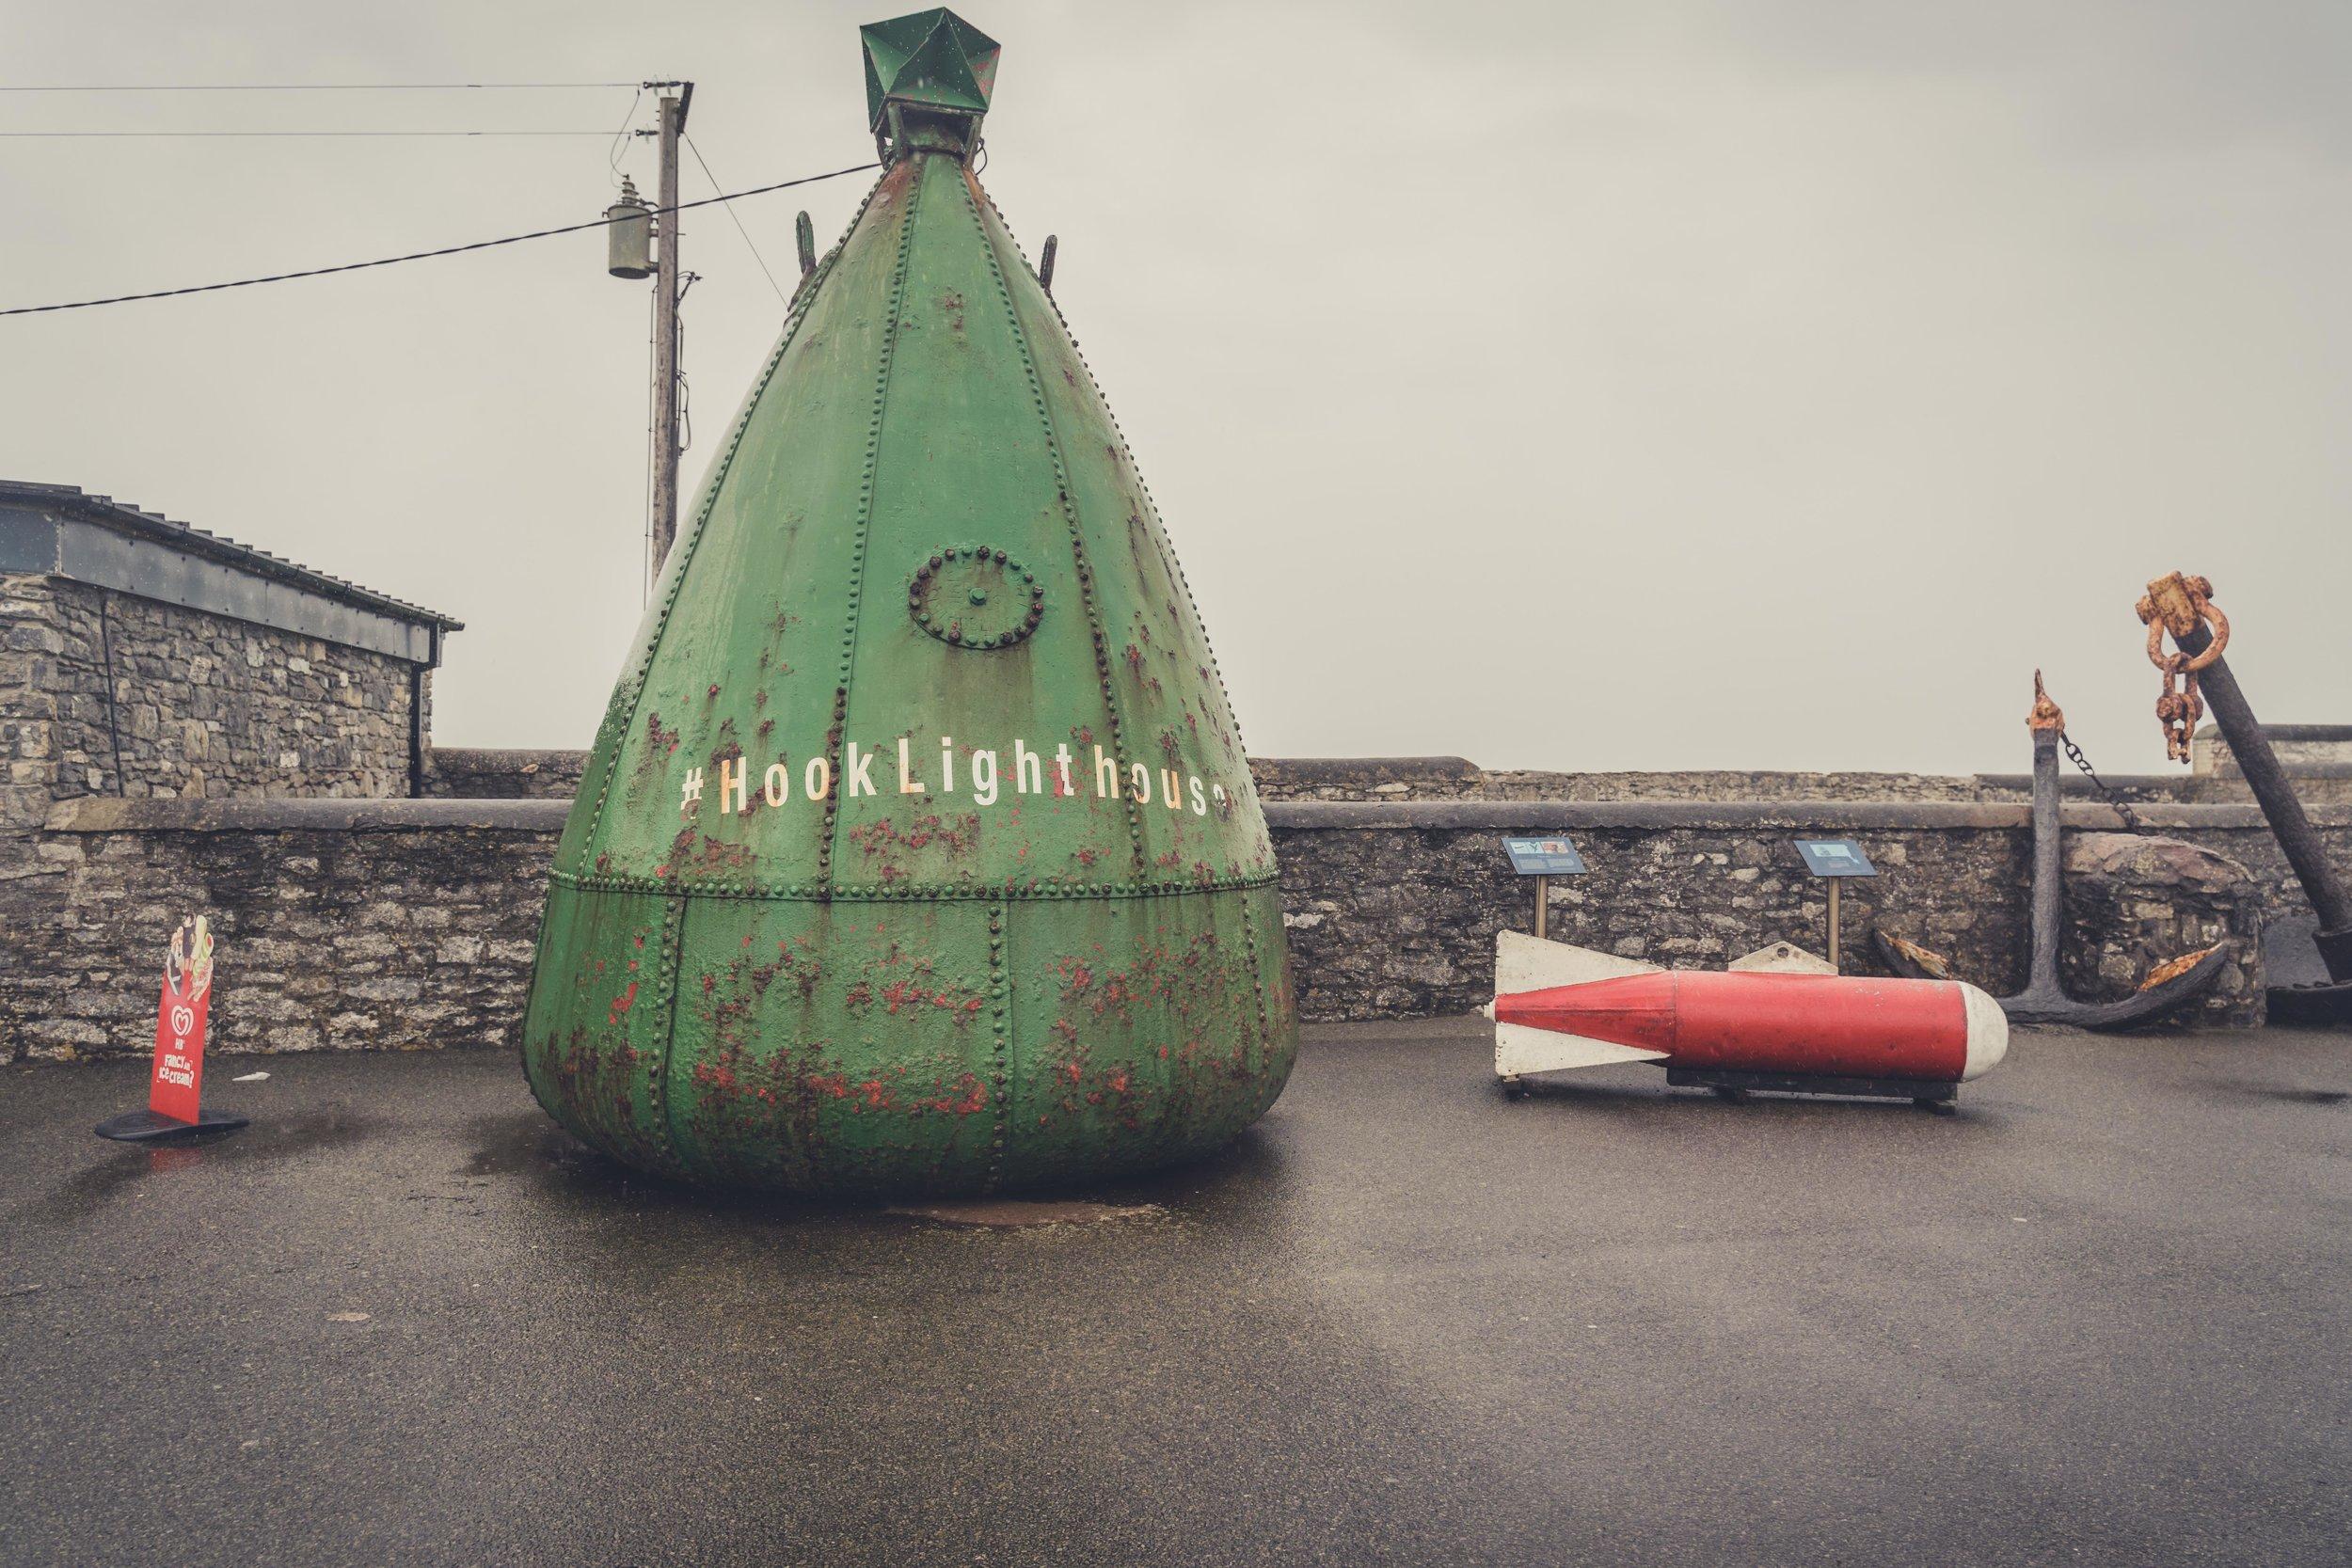 Hookhead Lighthouse wexford ireland #visitwexford.jpg